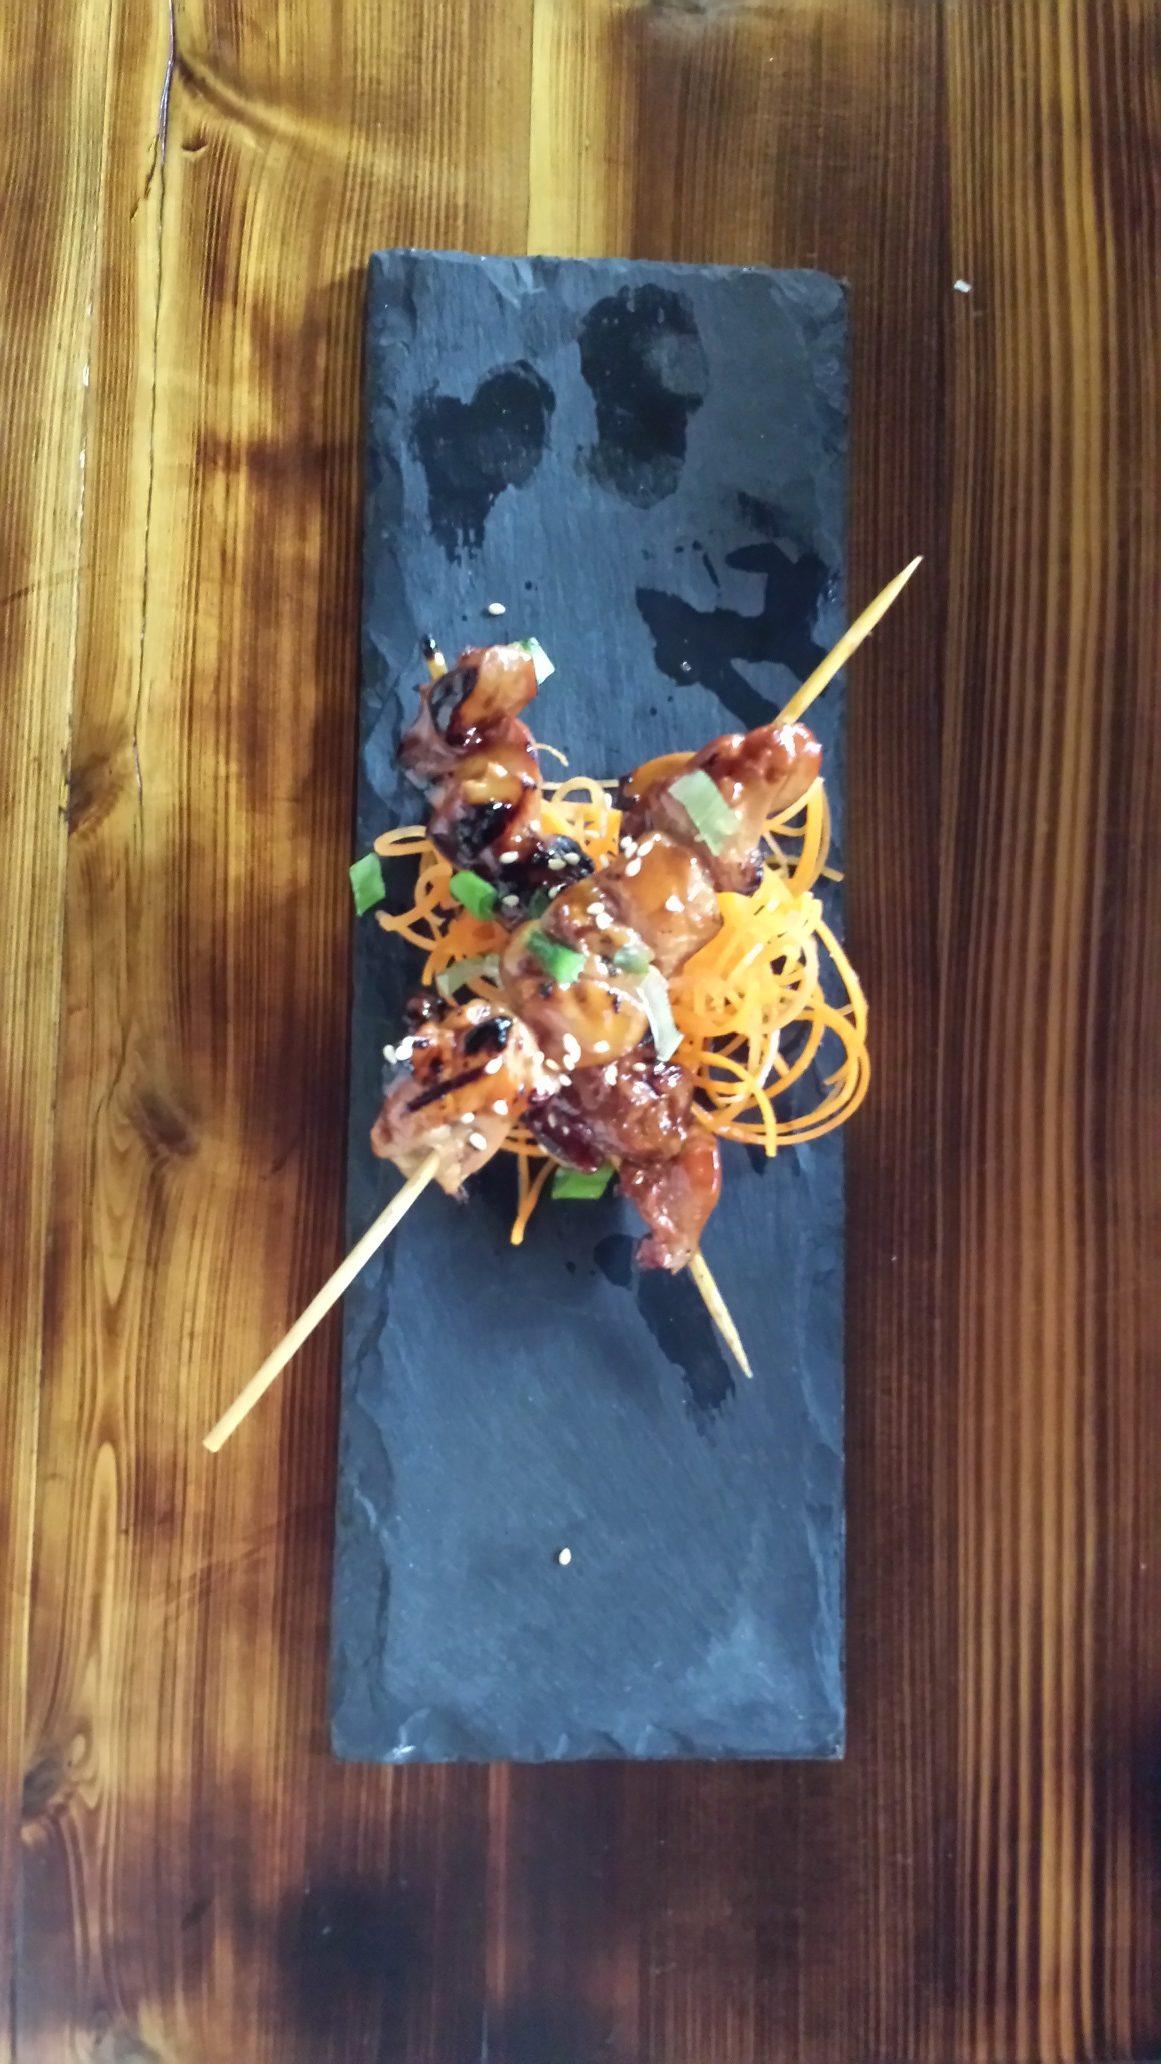 Yakitori (skewered, grilled chicken) dish at Kimura. Photo by Winslow Swart.